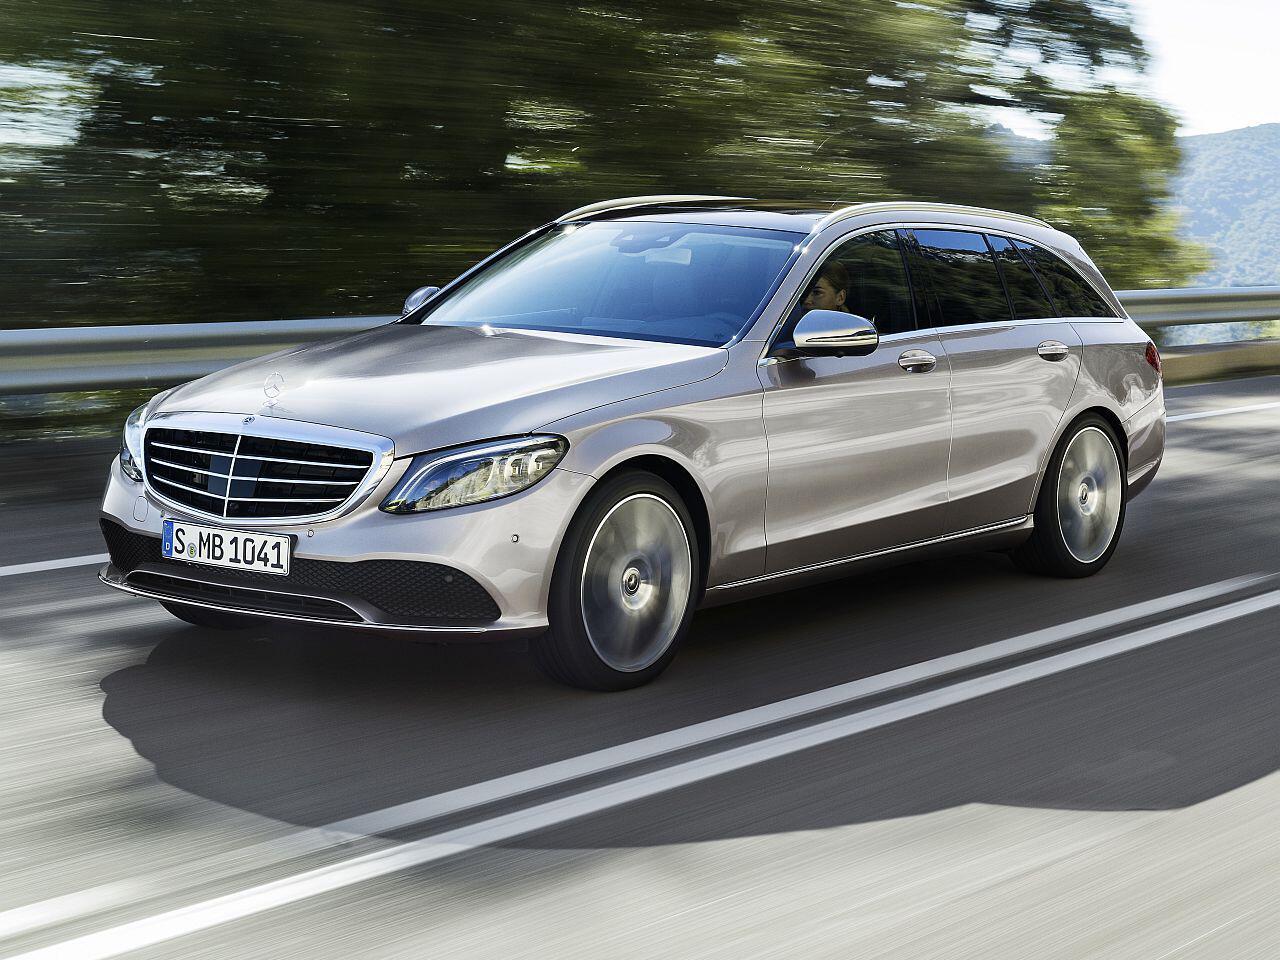 Bild zu Platz 8: Mercedes-Benz C-Klasse